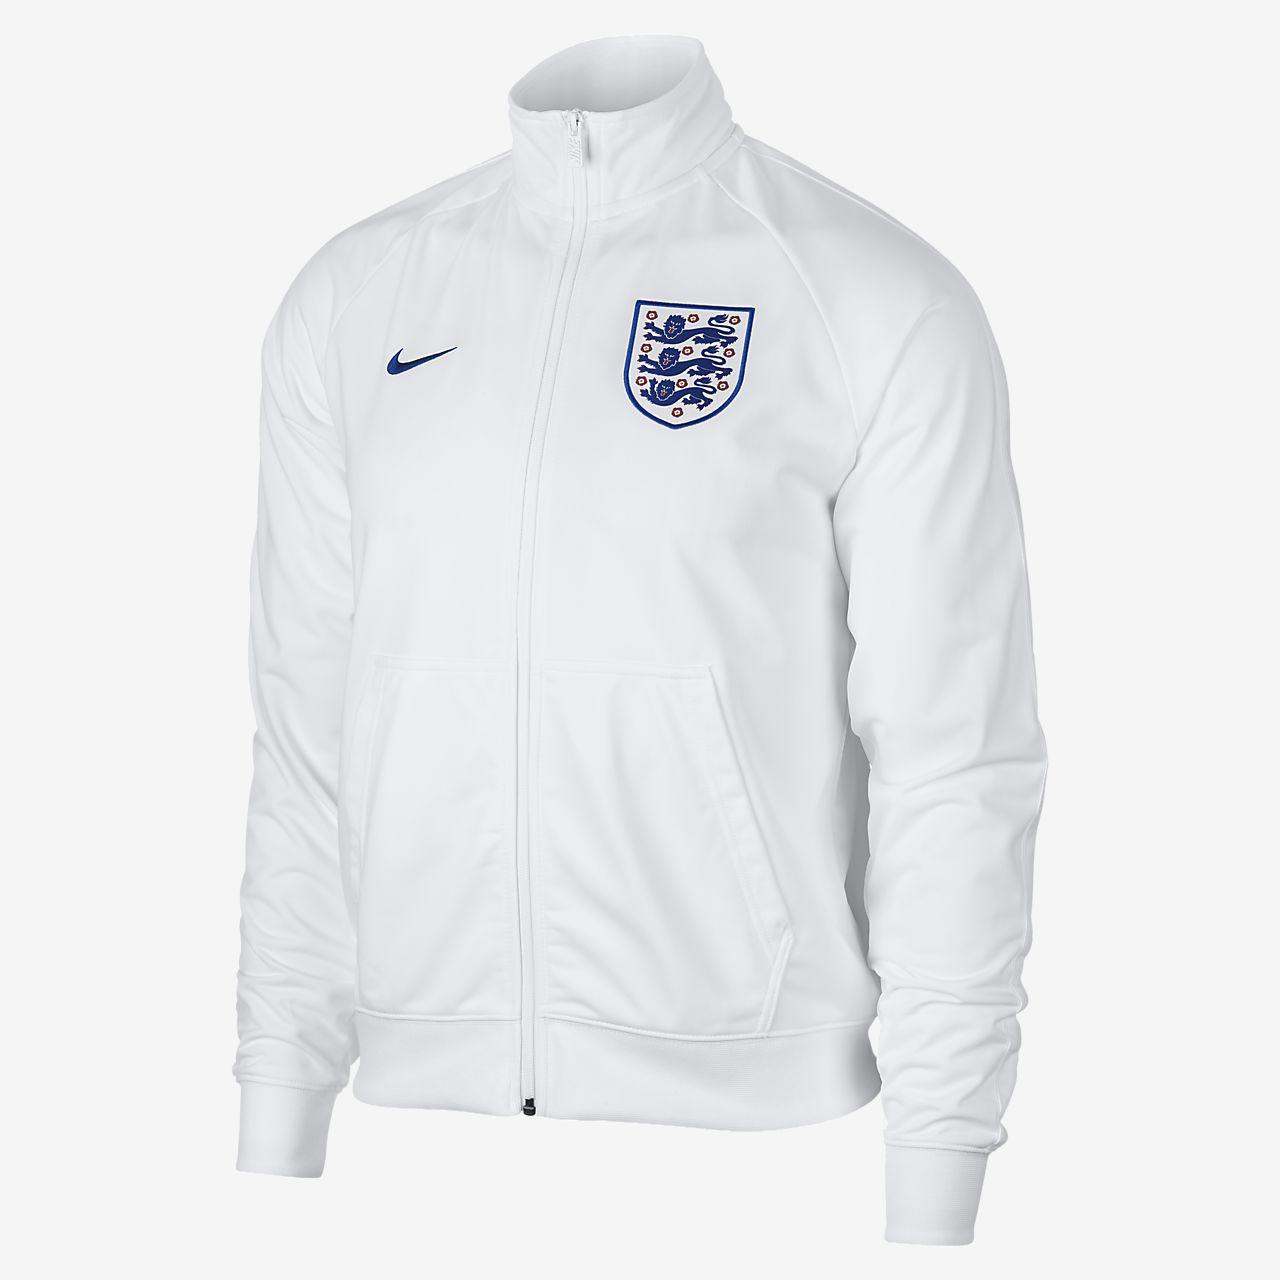 England Men's Track Jacket